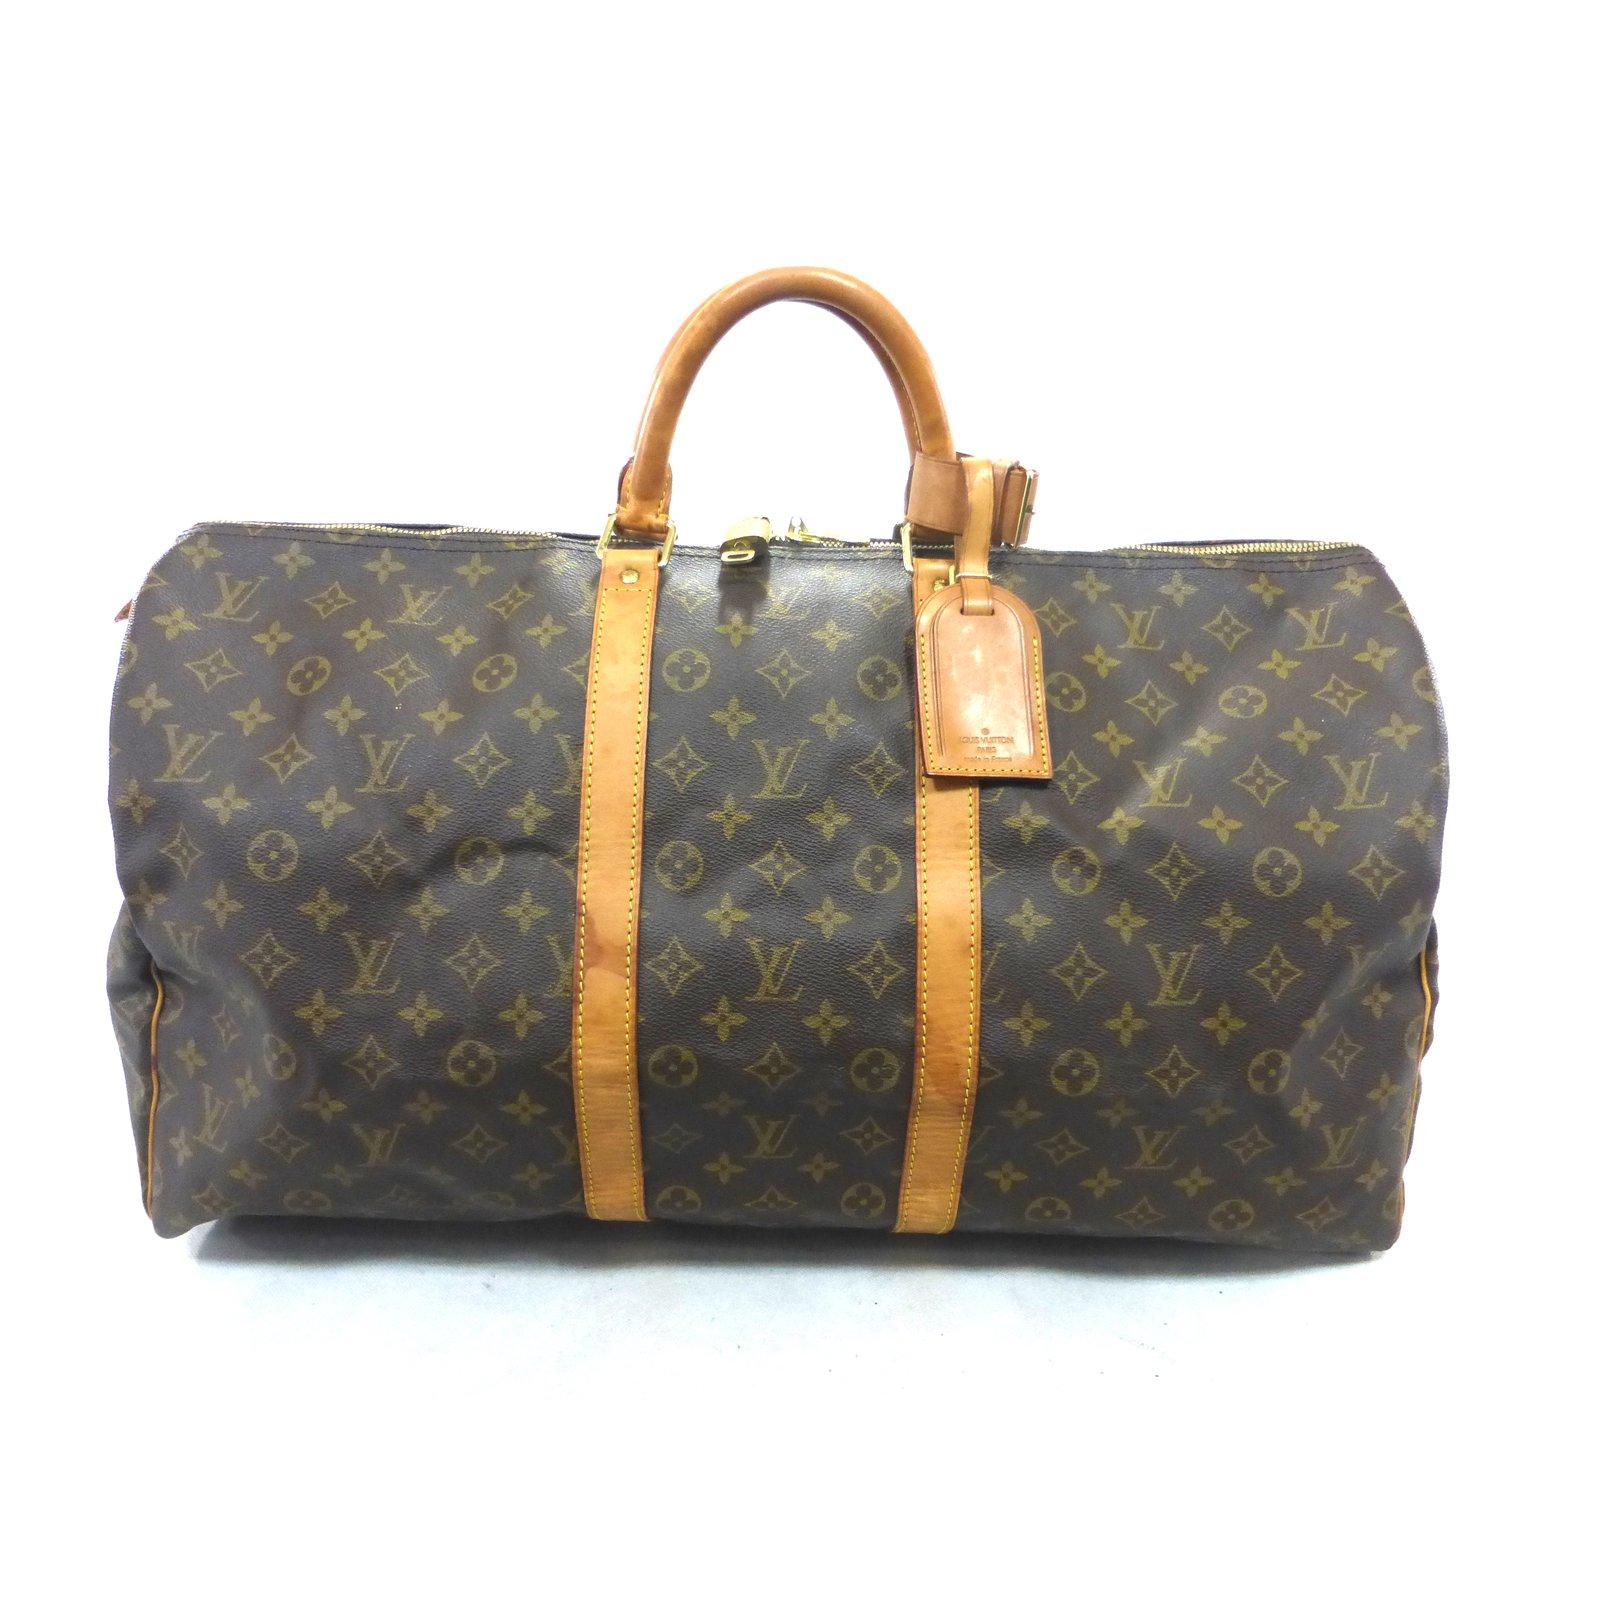 ef6643533e175 Louis Vuitton keepall 55 Monogram Travel bag Leather Brown ref.104030